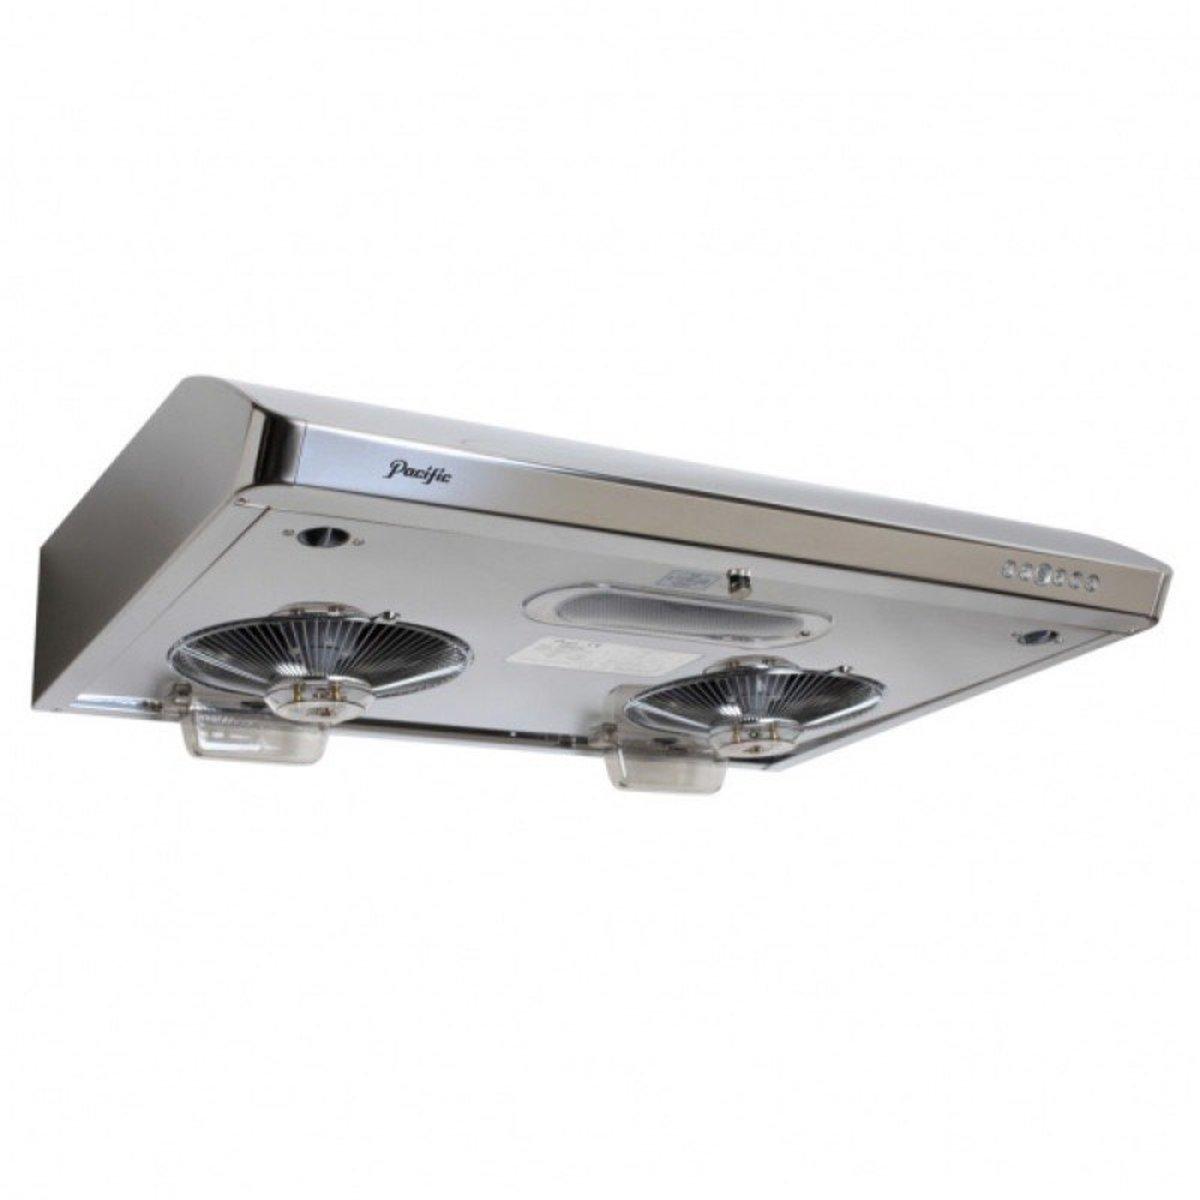 "FV-712N ""Sirocco"" Range Hood (Soft touch design) (LED lamp model) Silver"